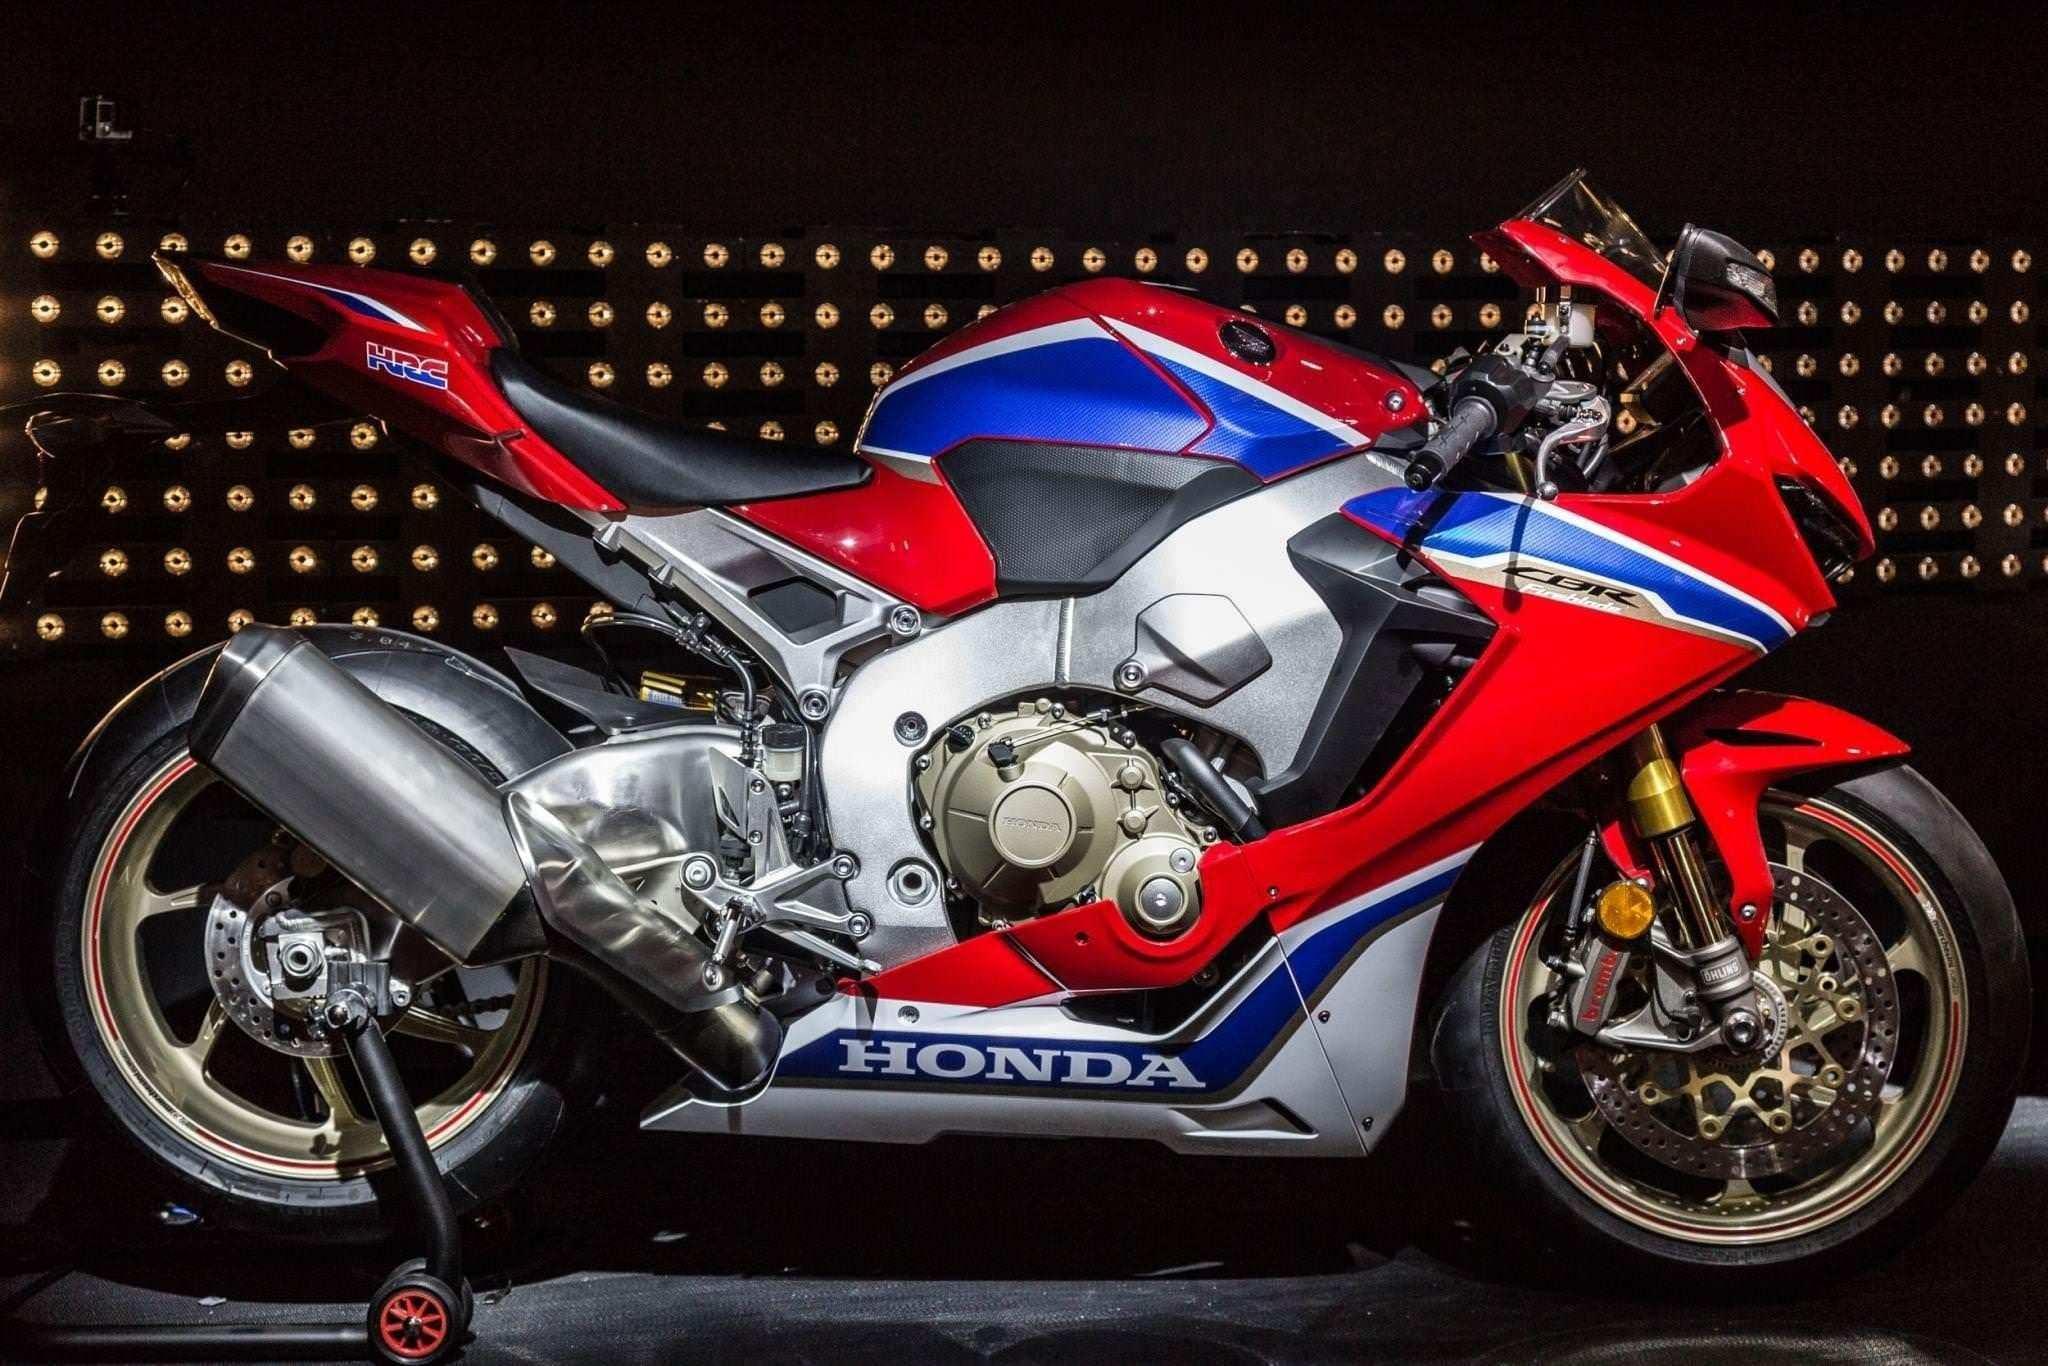 89 All New 2019 Honda 1000Rr Concept with 2019 Honda 1000Rr